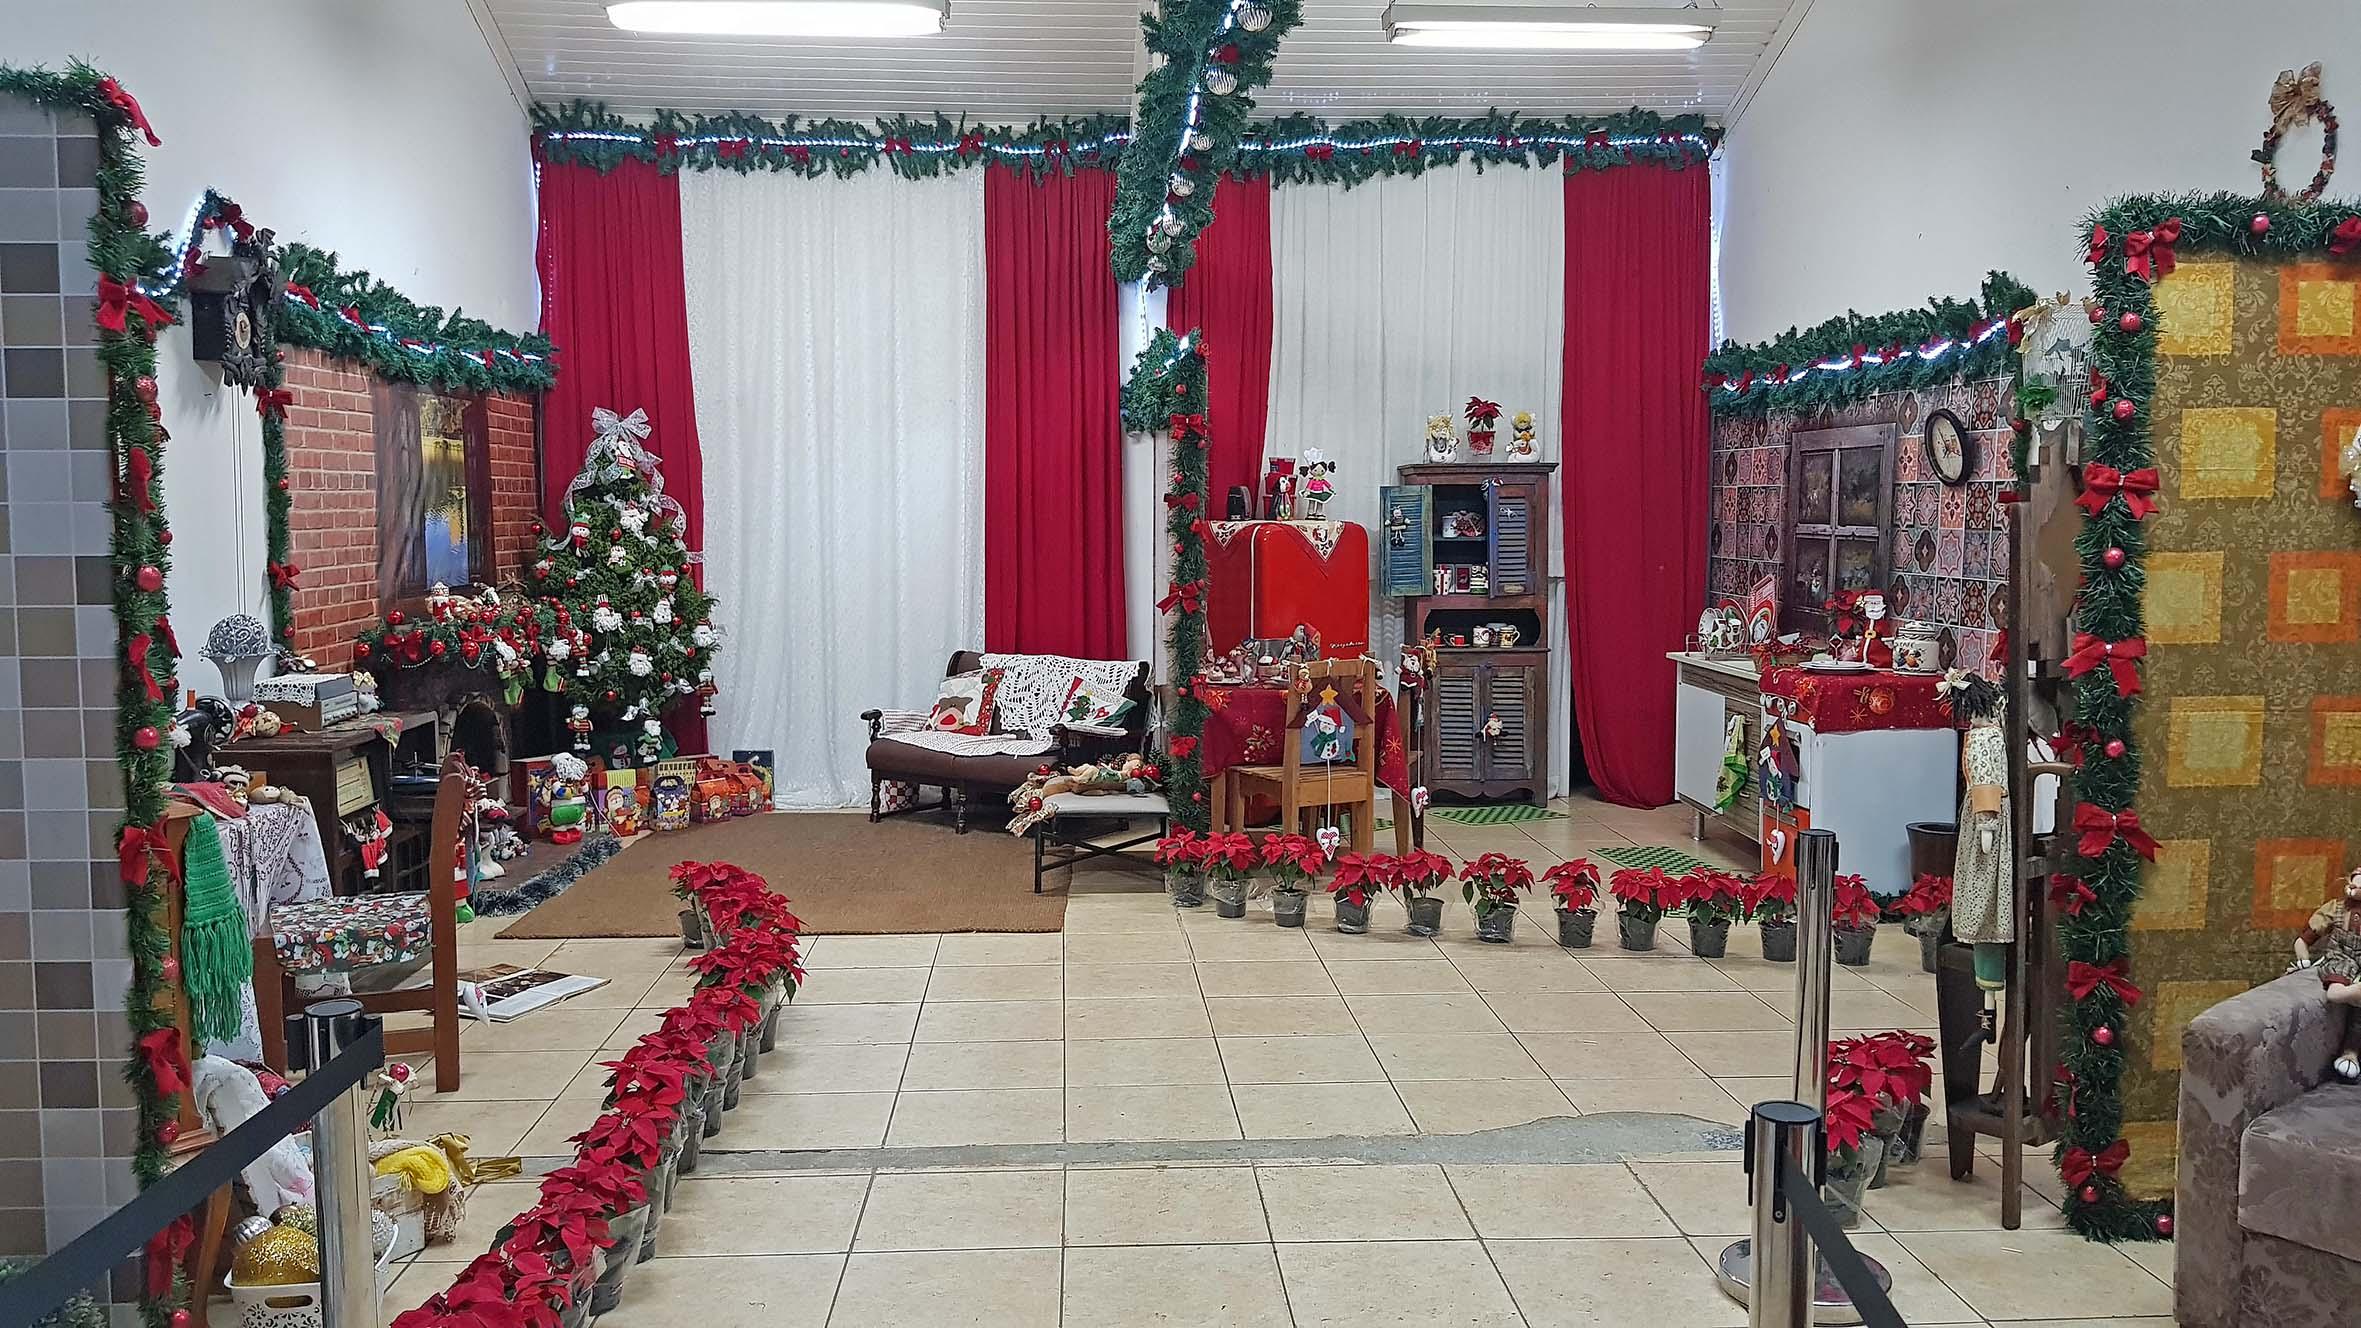 09.12.2017 Casa do Papai Noel (12)